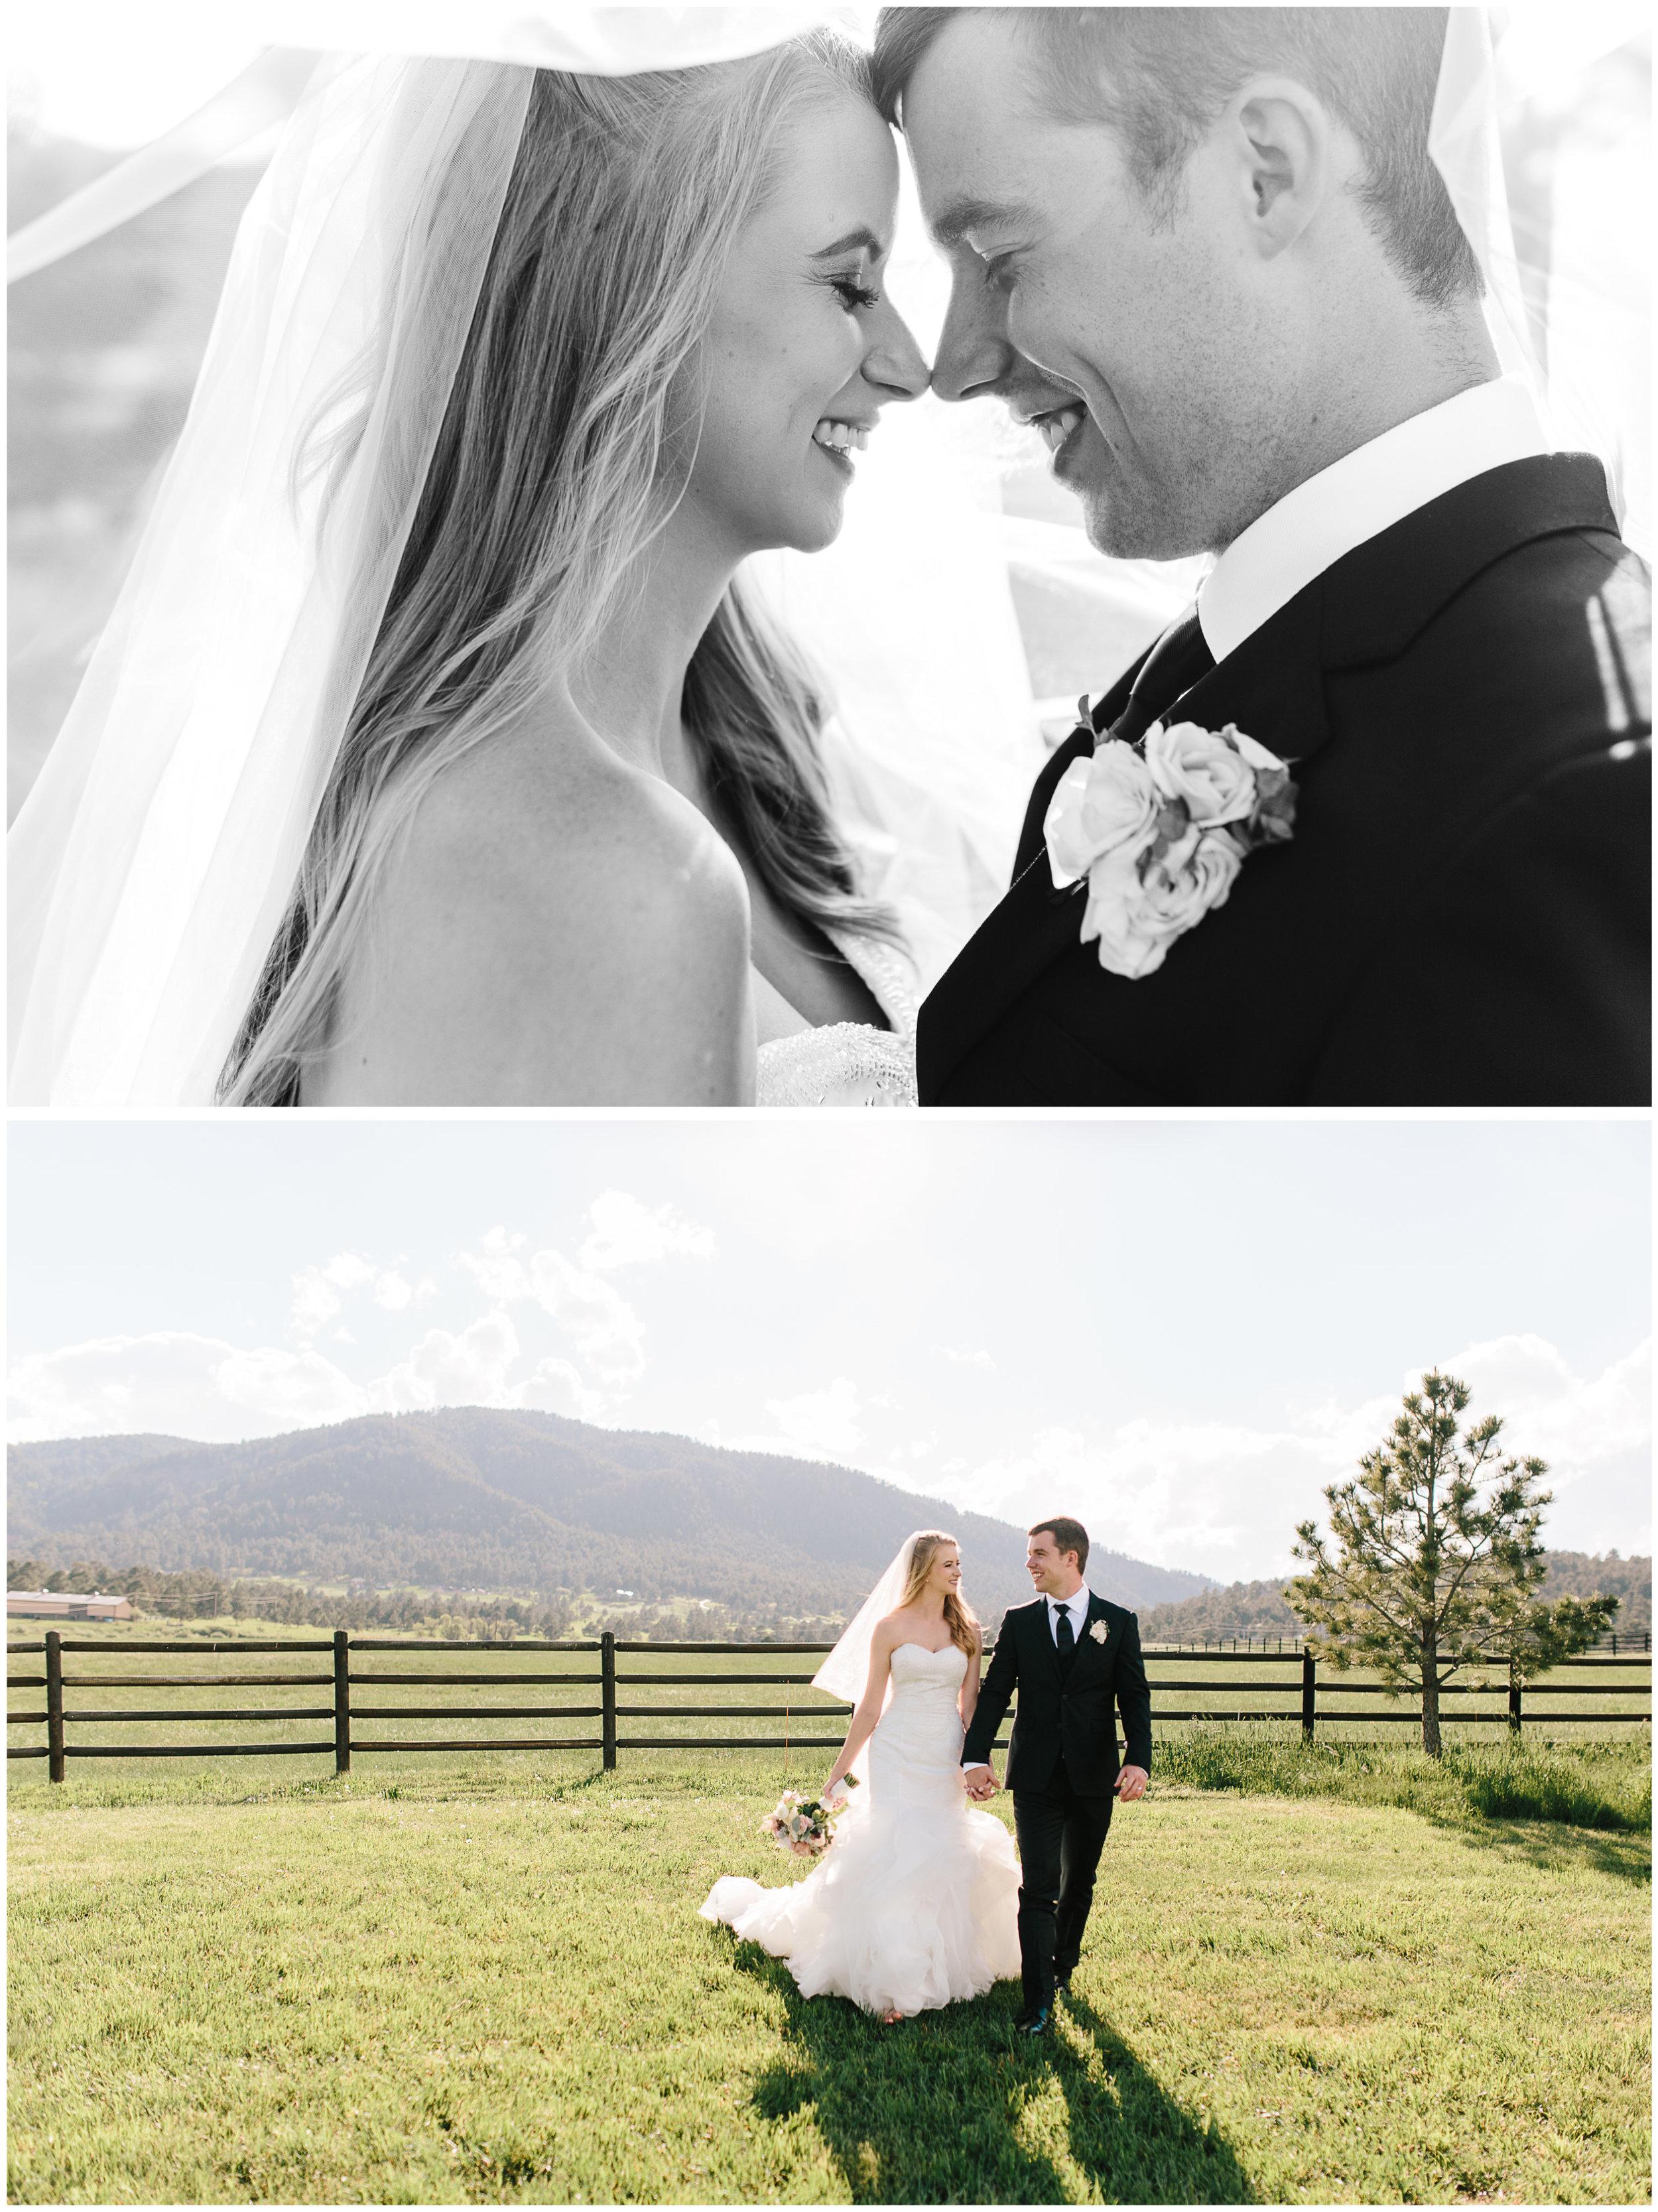 spruce_mountain_ranch_wedding_40.jpg